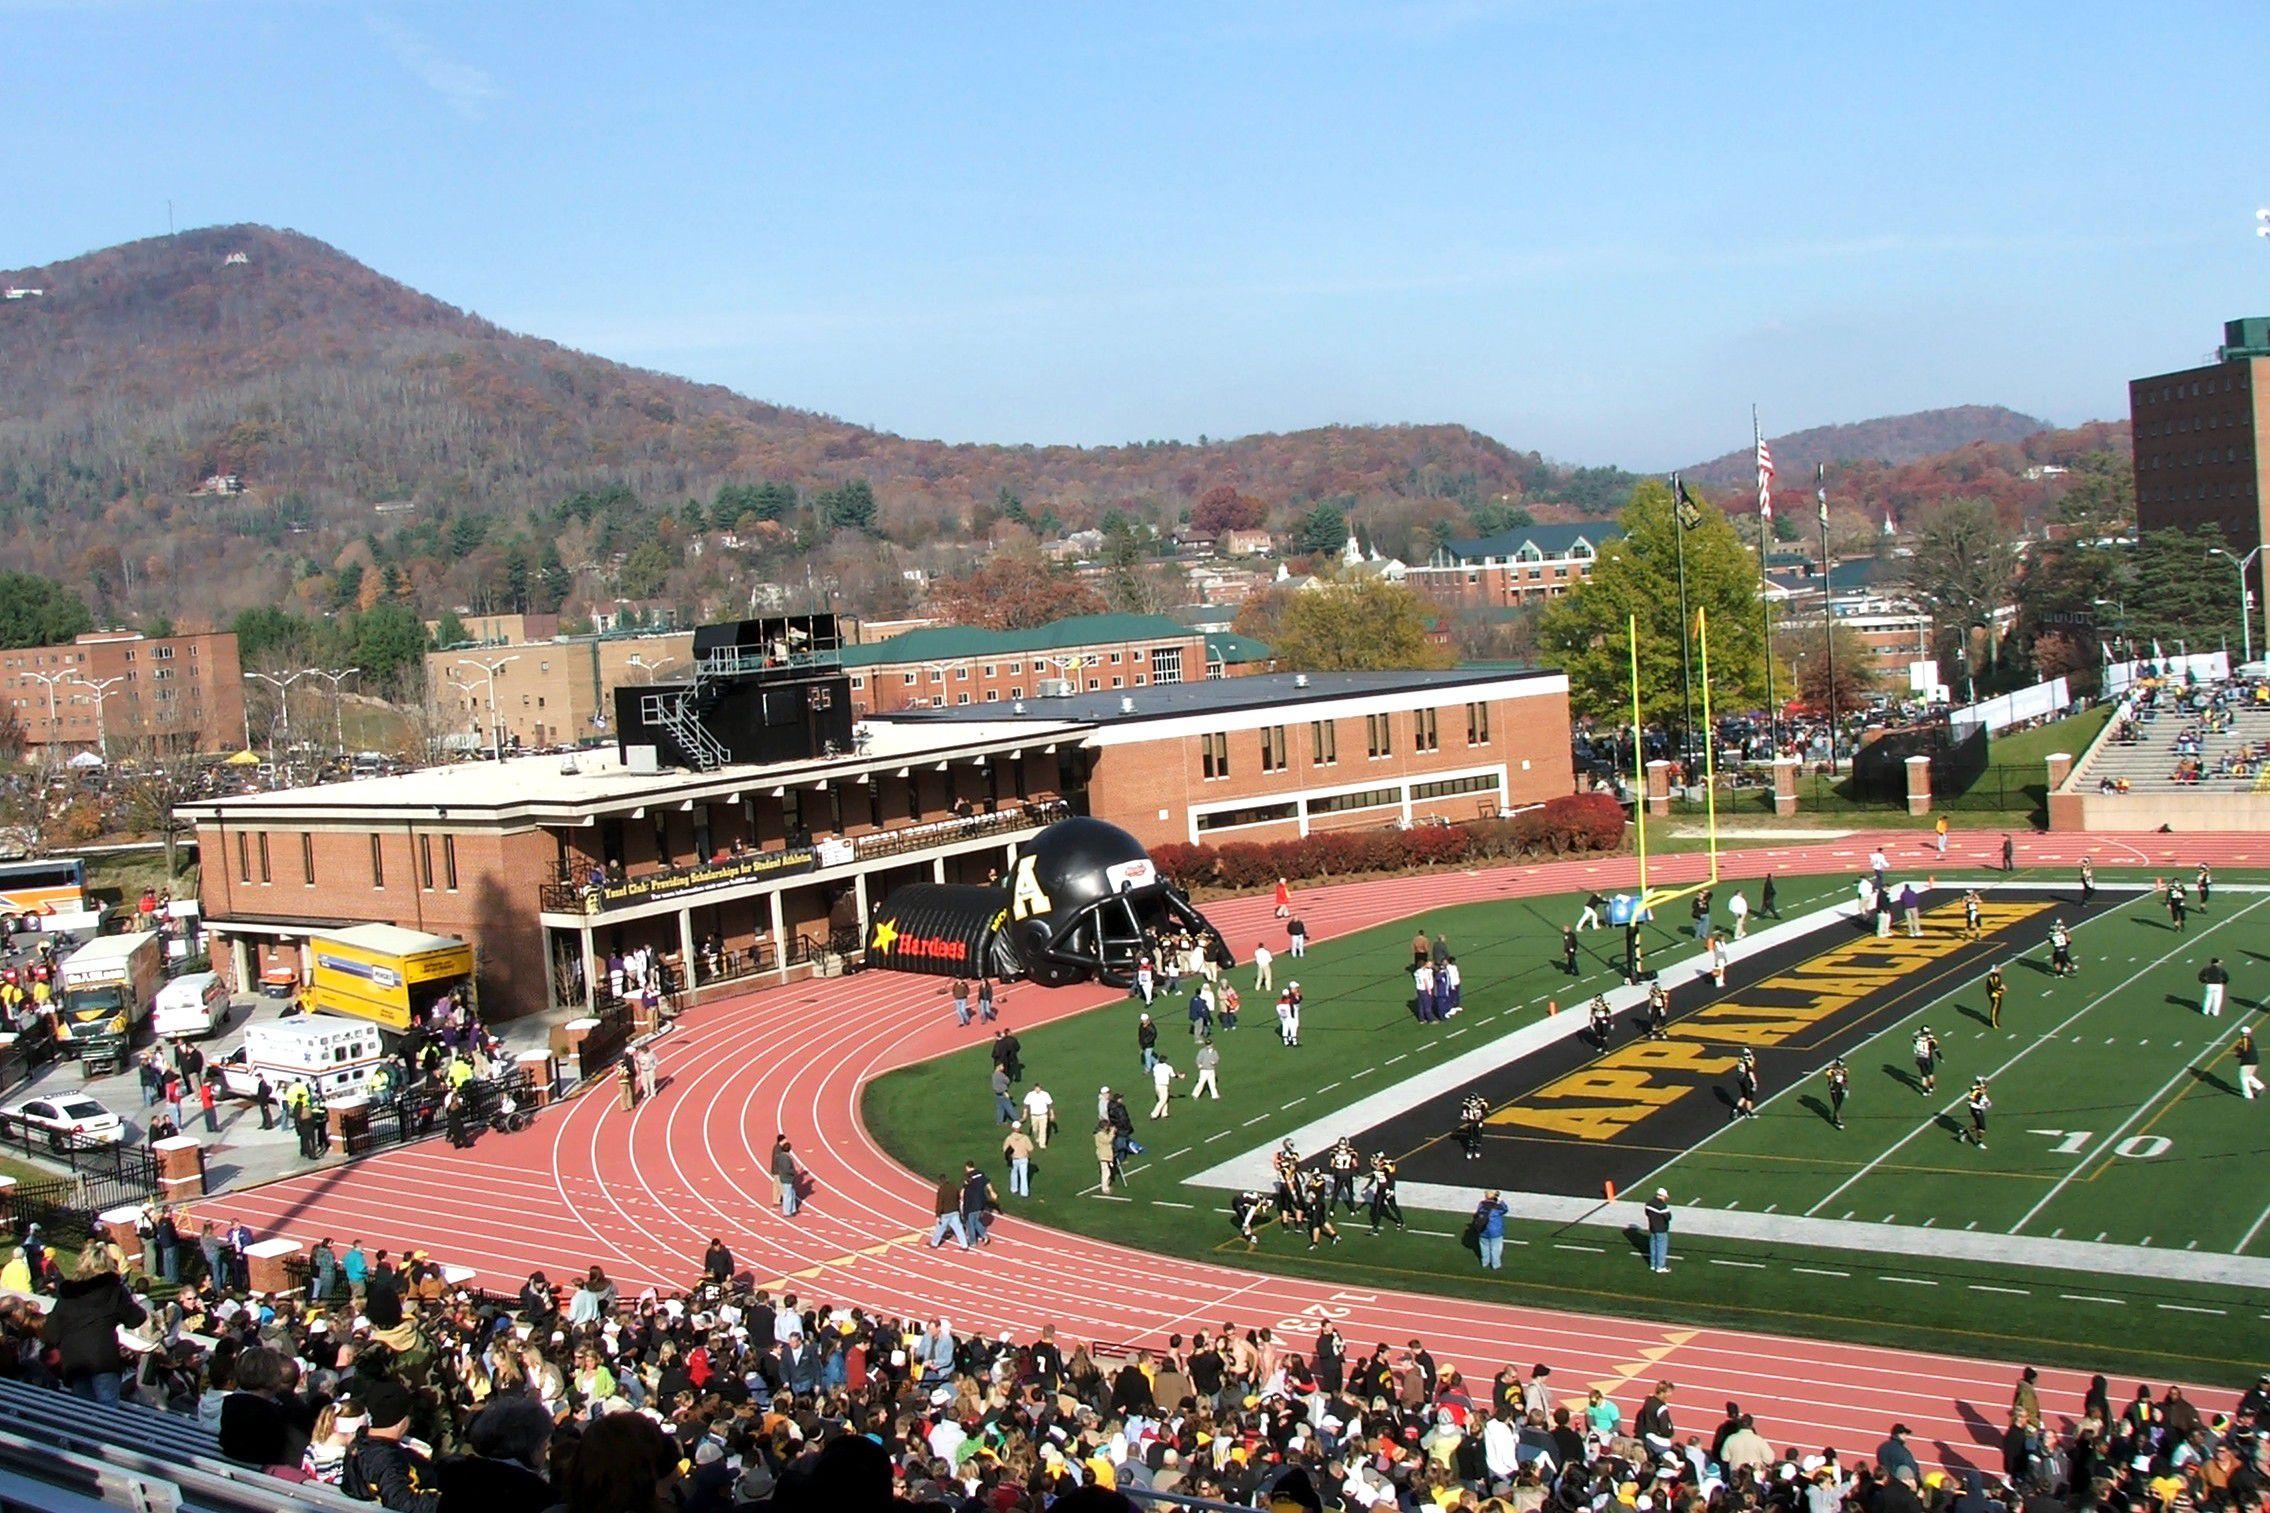 Inside Appalachian State's Kidd Brewer Stadium set against a mountainous backdrop